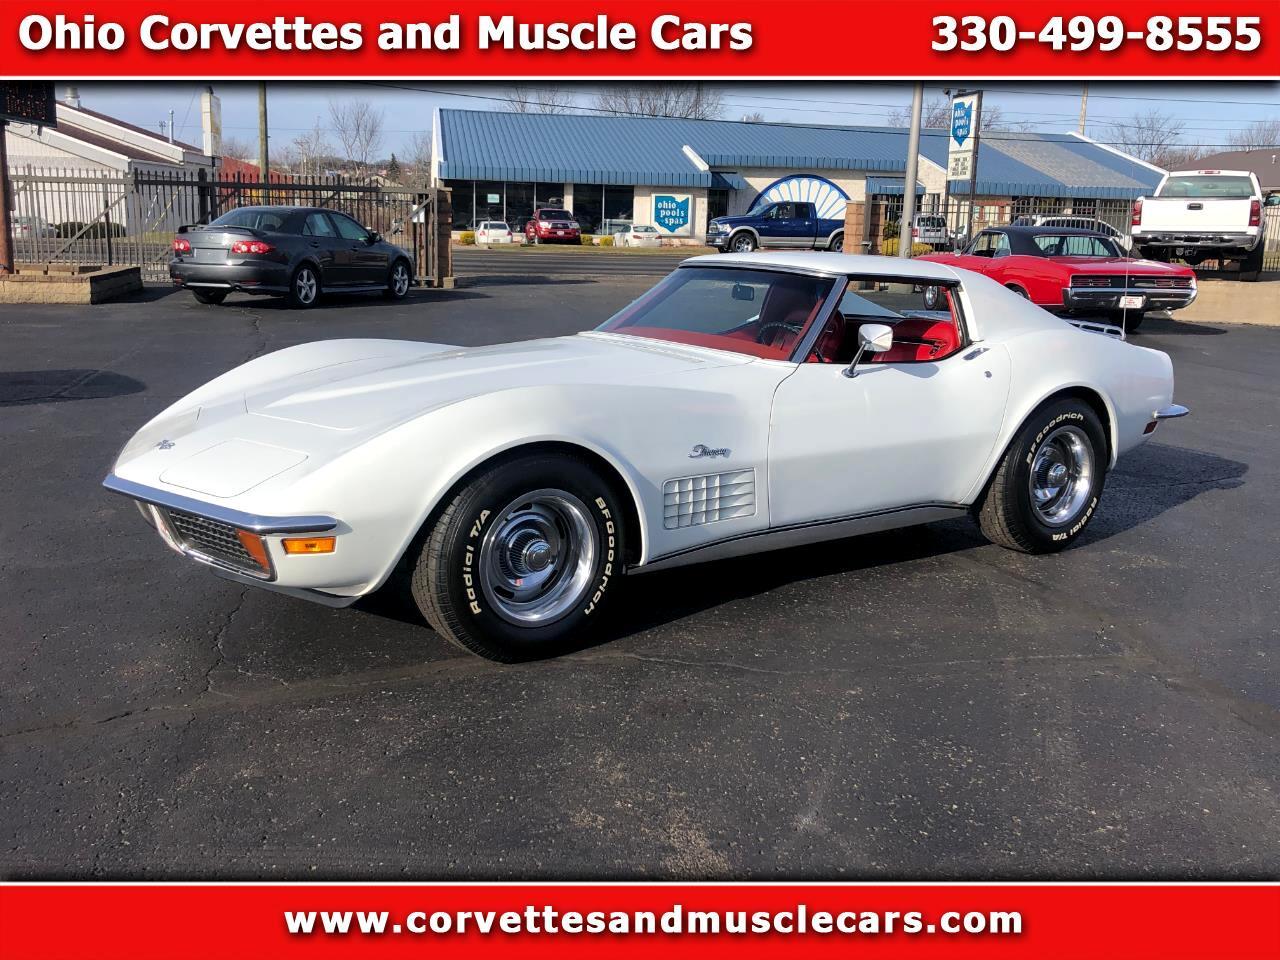 The 1972 Chevrolet SSR LS photos